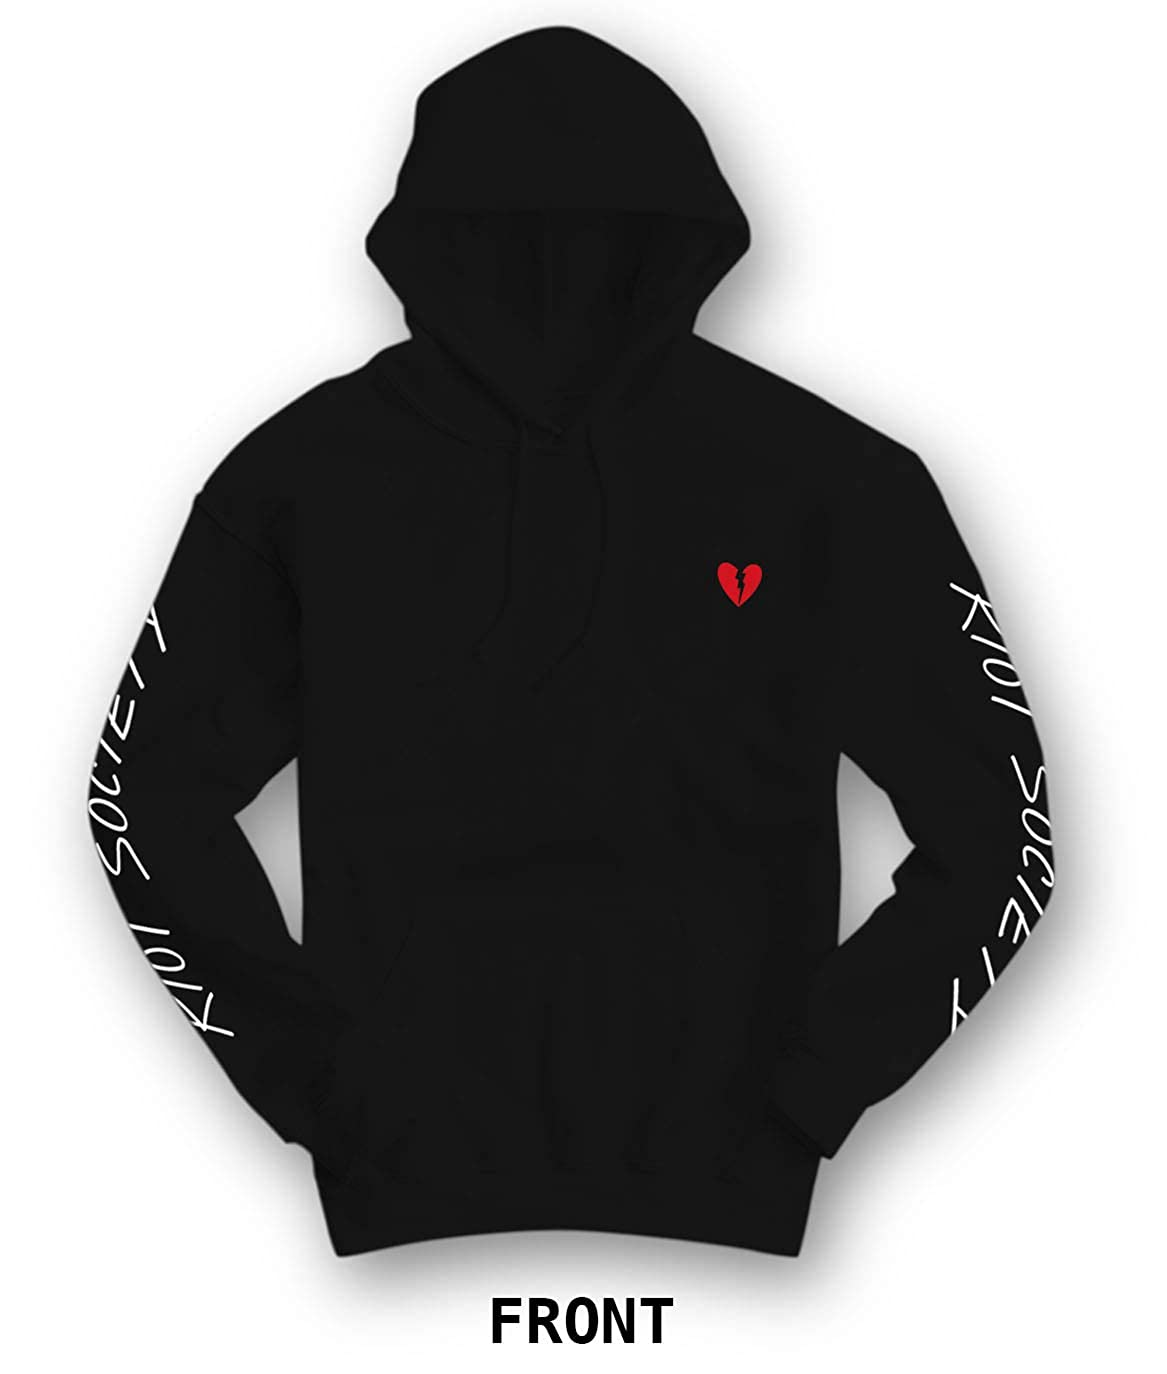 quality design df0dc 2a57b Amazon.com  Riot Society Men s Graphic Hoodie Hooded Sweatshirt  Clothing